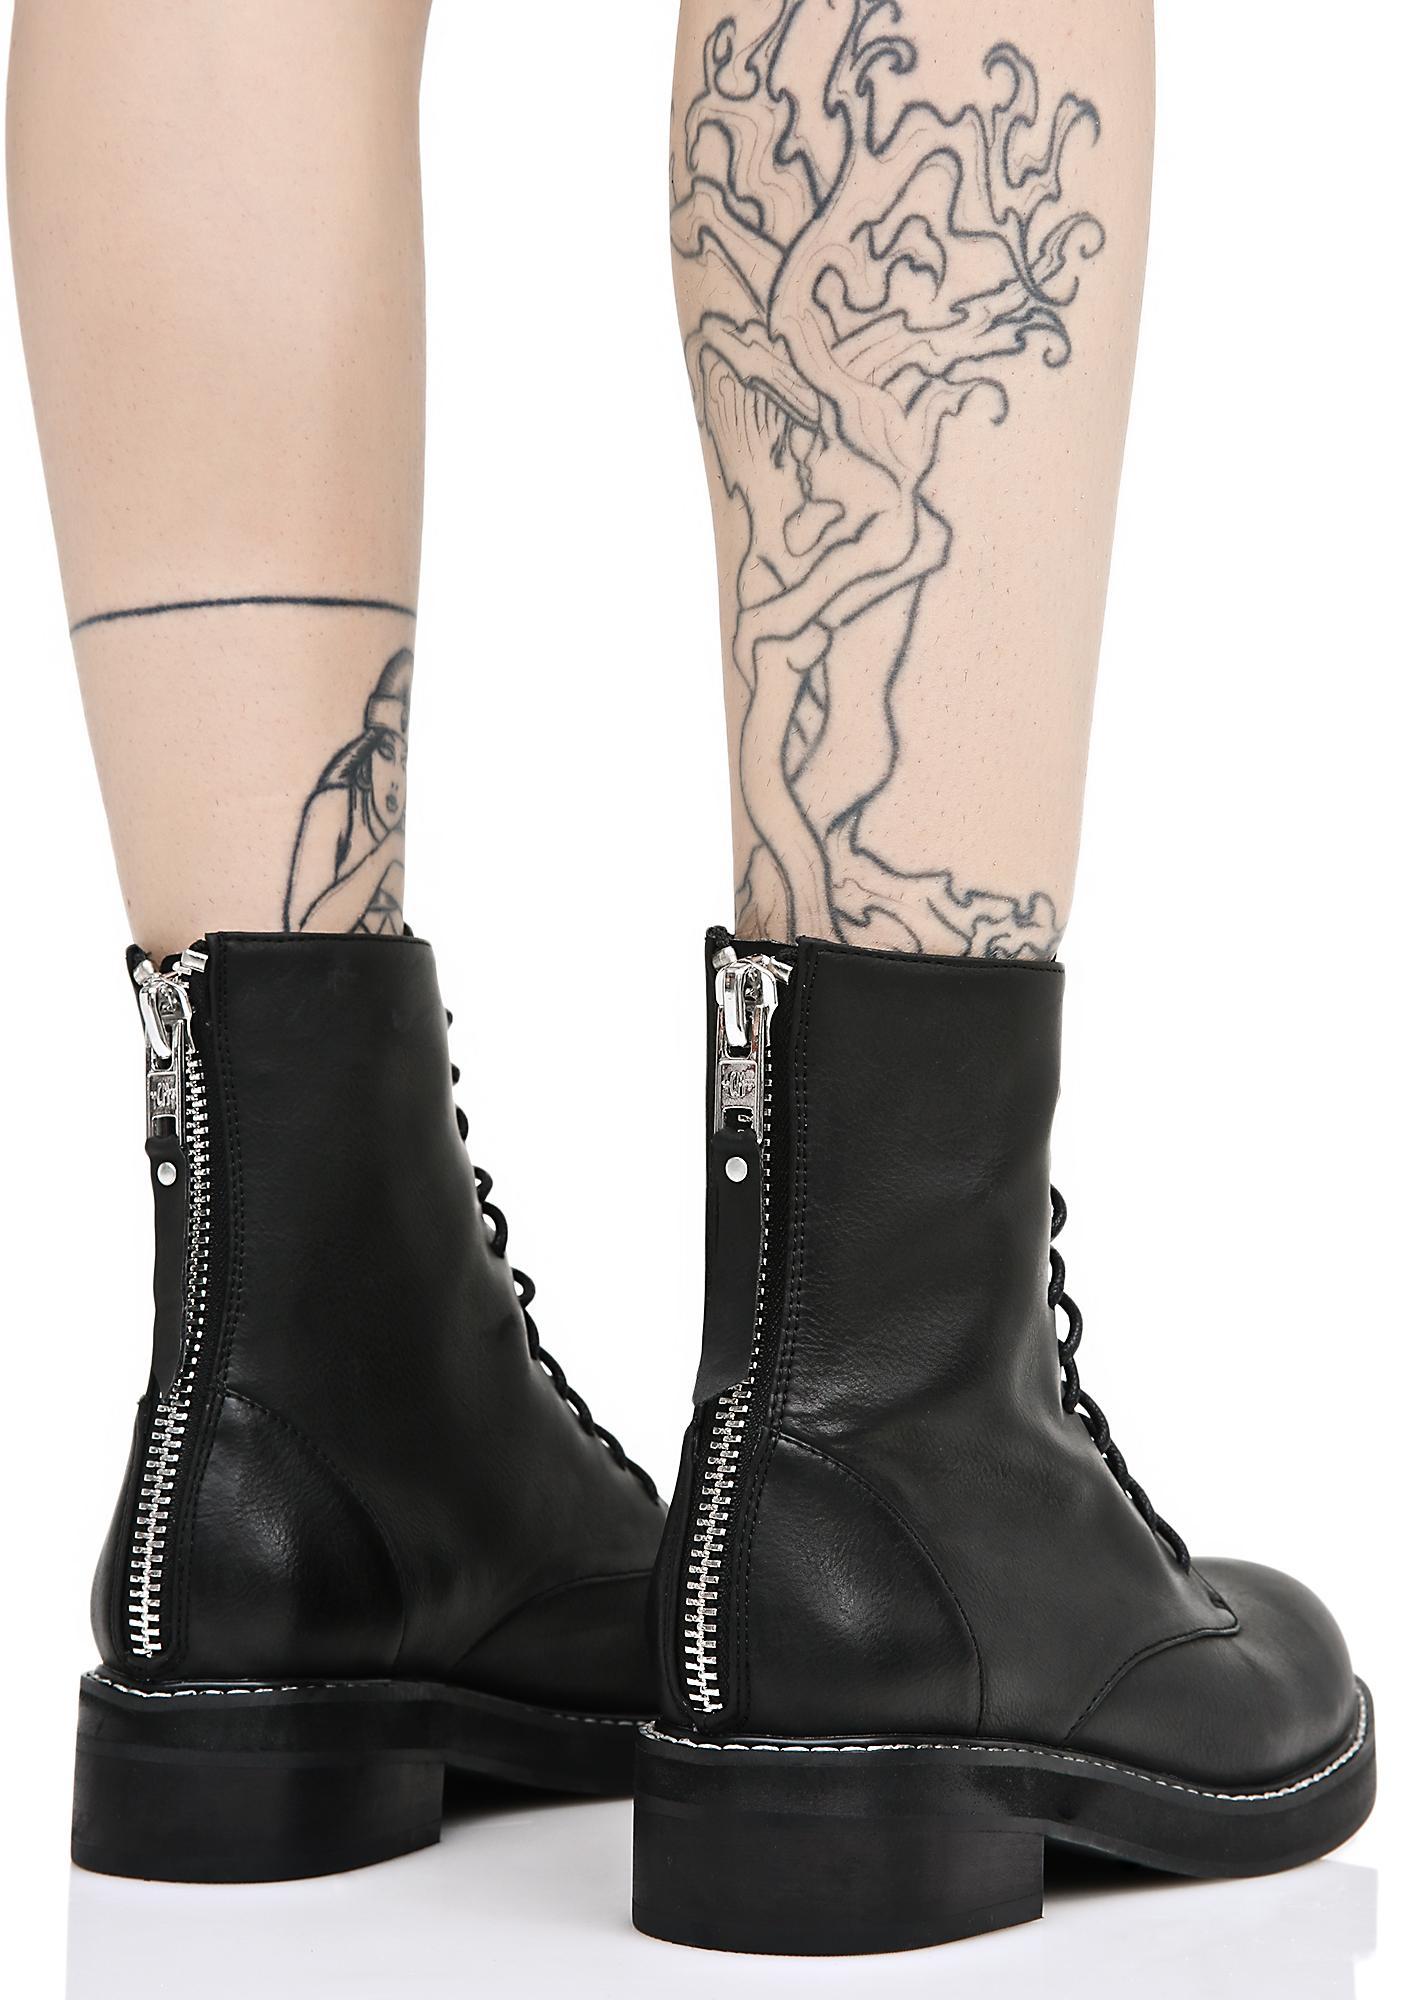 Current Mood Eyeletless Boots